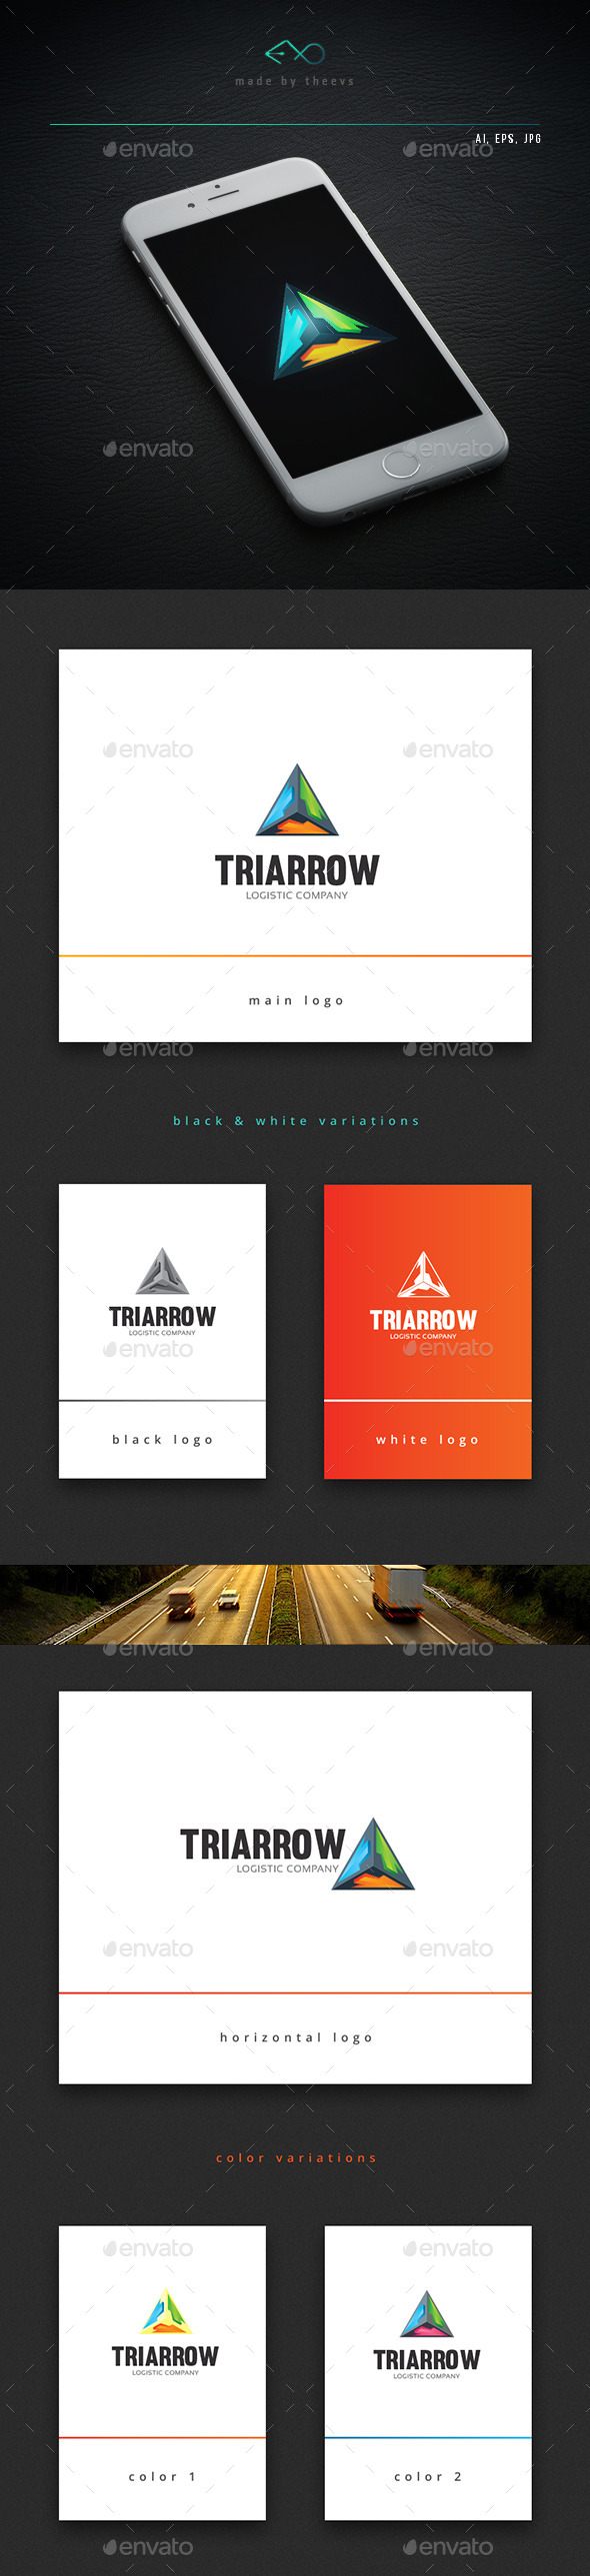 Triarrow - Vector Abstract